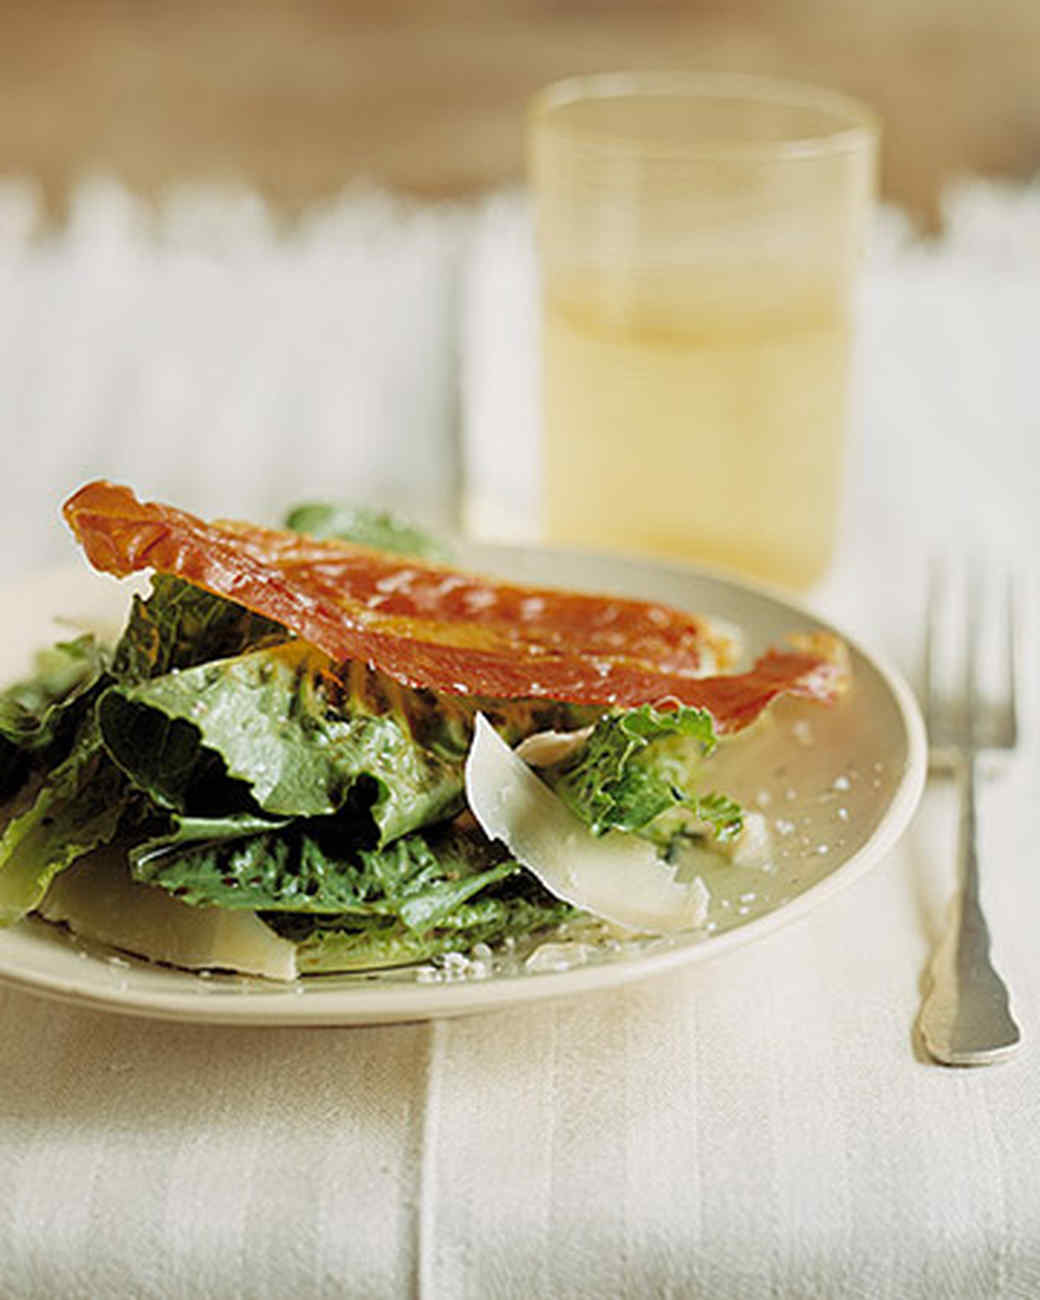 Romaine Salad with Prosciutto Crisps